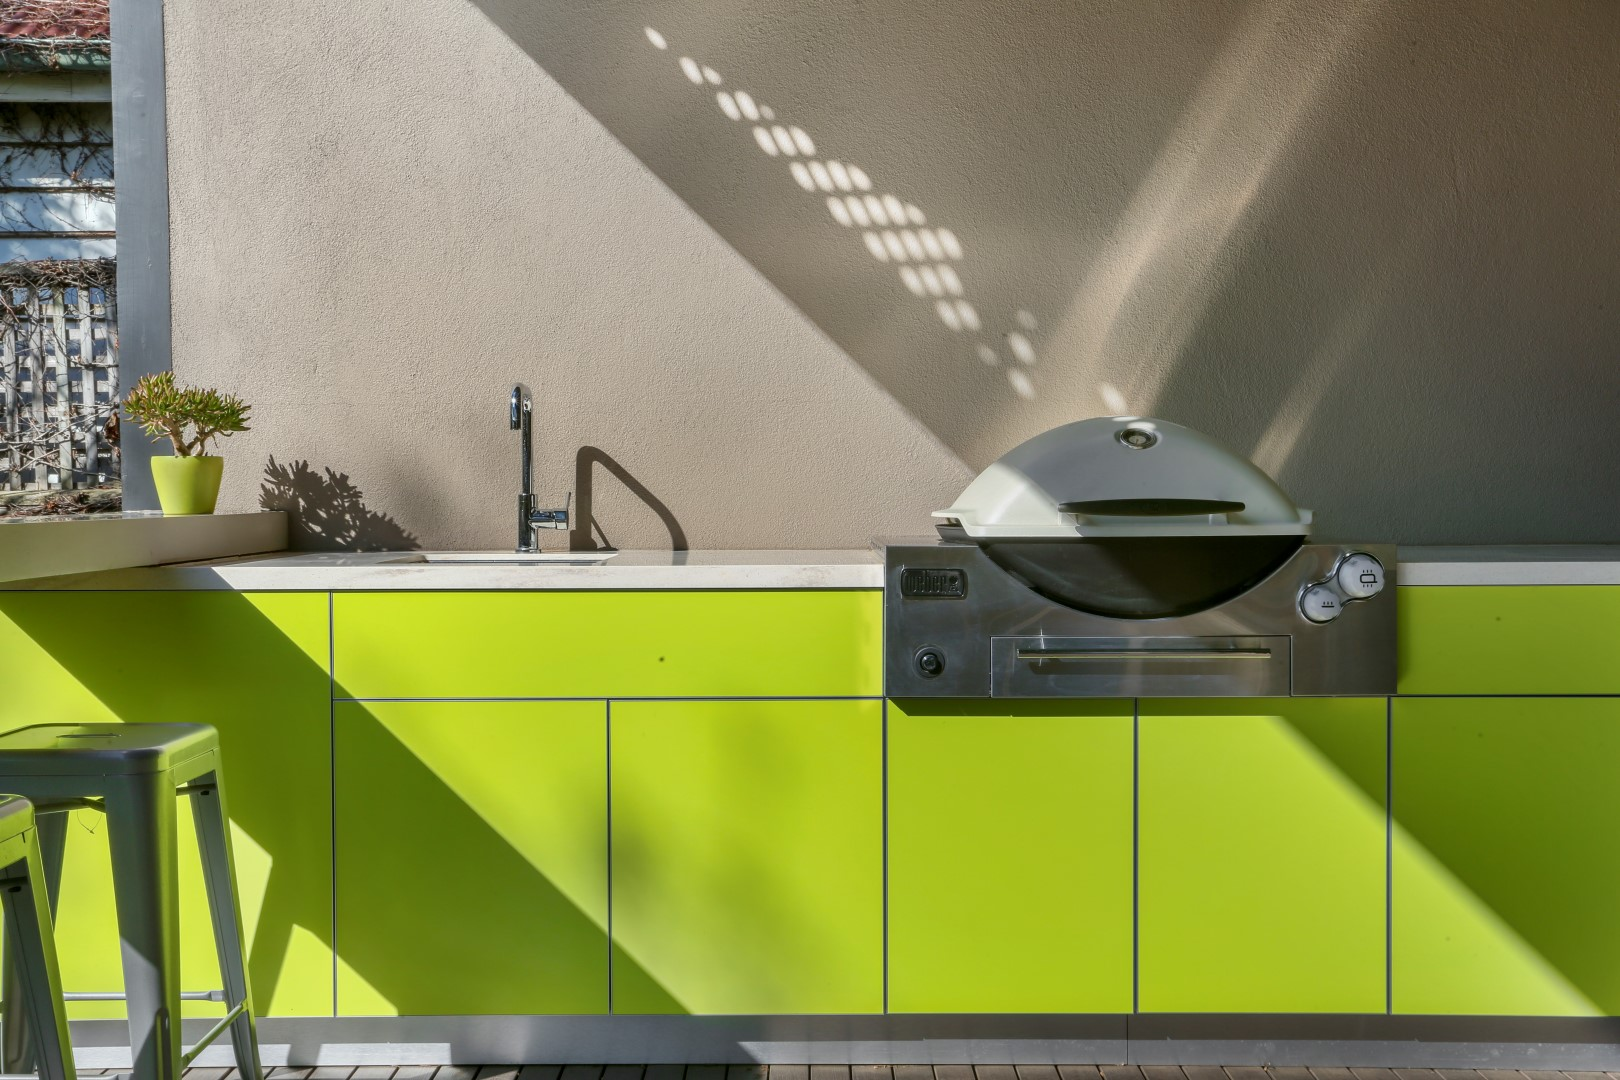 Weber-Q3600-Dulux-Rainforest-Glow-Corian-Concrete-and-Clam-Shell-Alfresco-Kitchen-7-1